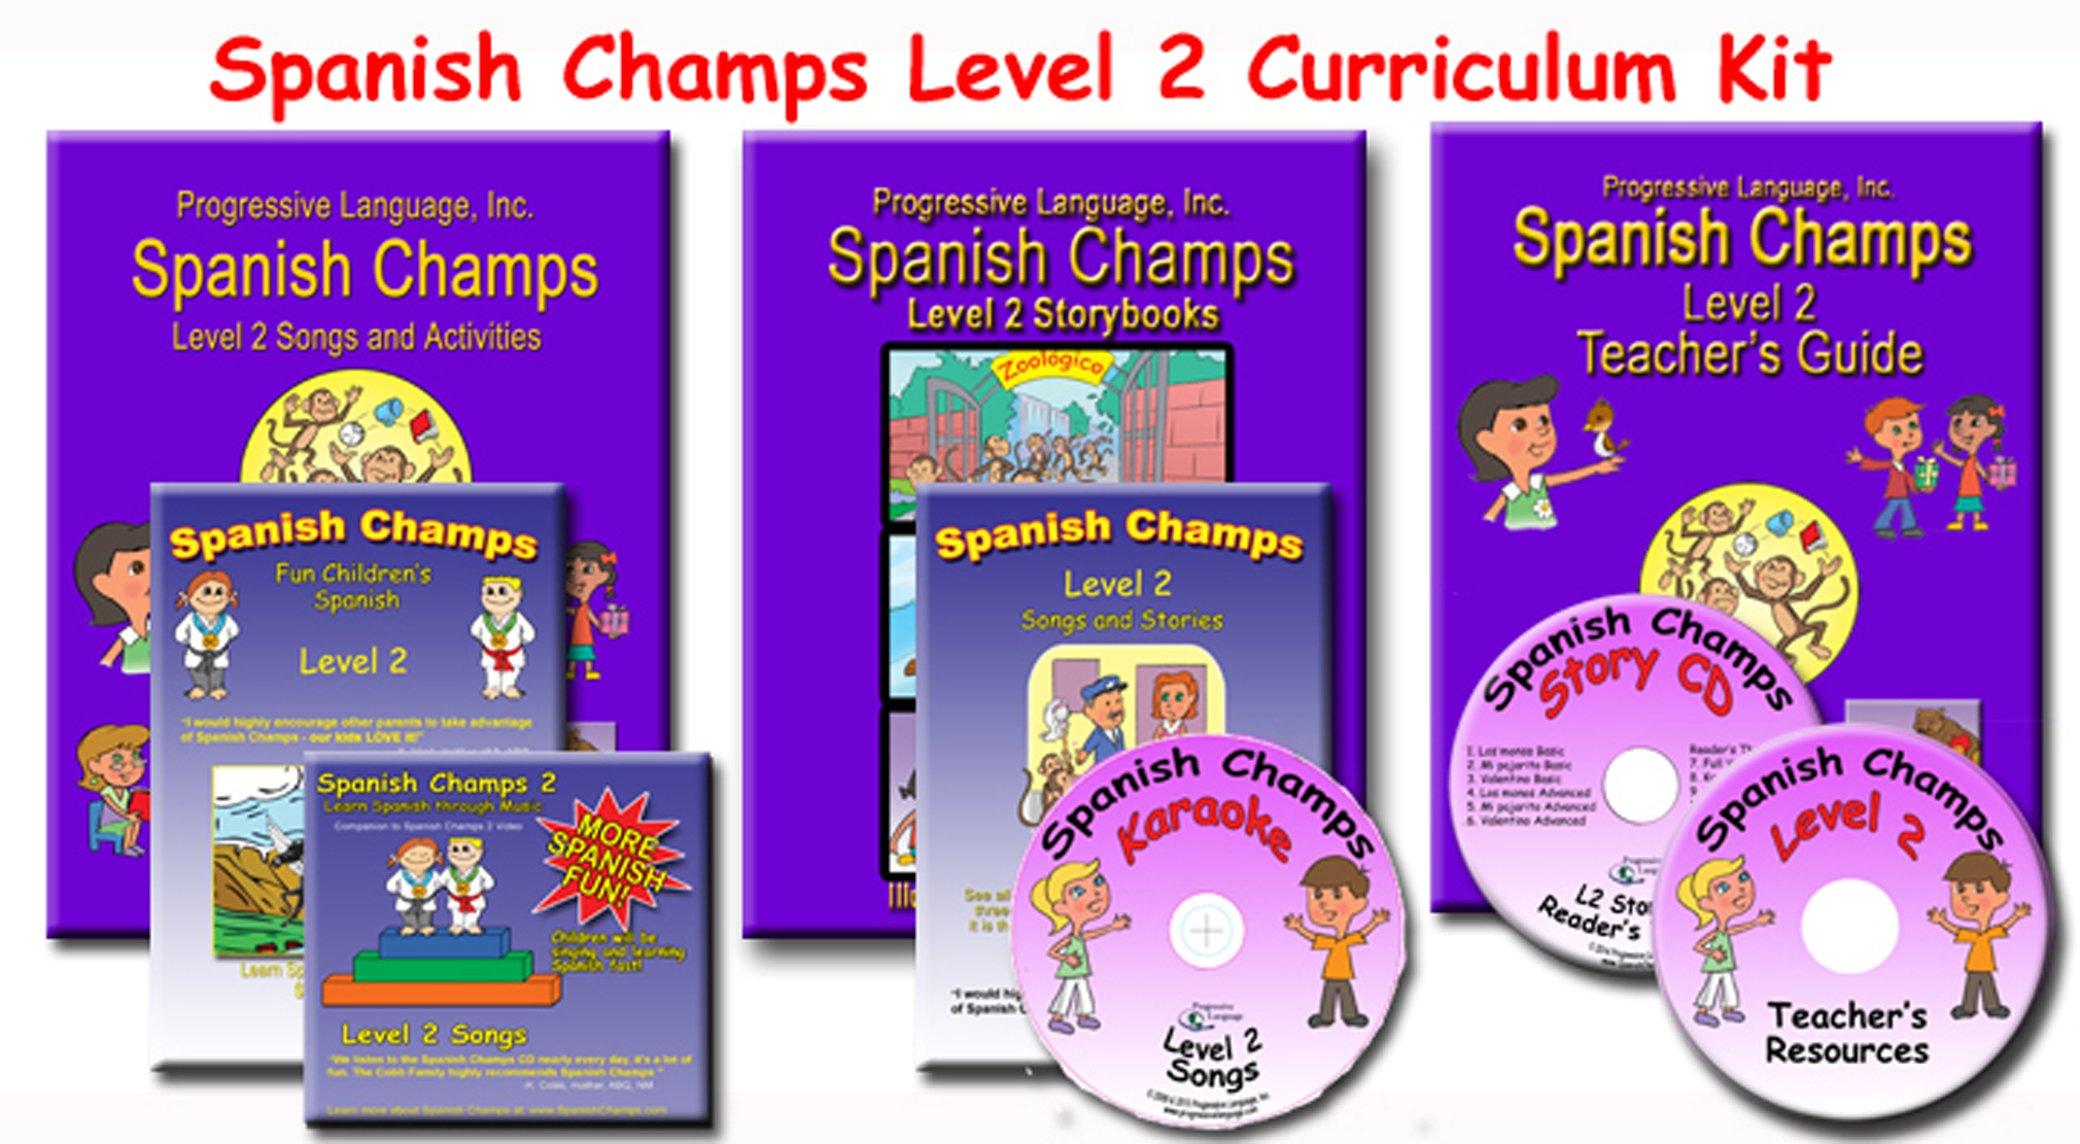 Preschool Spanish Curriculum, Spanish Champs Level 2 kit